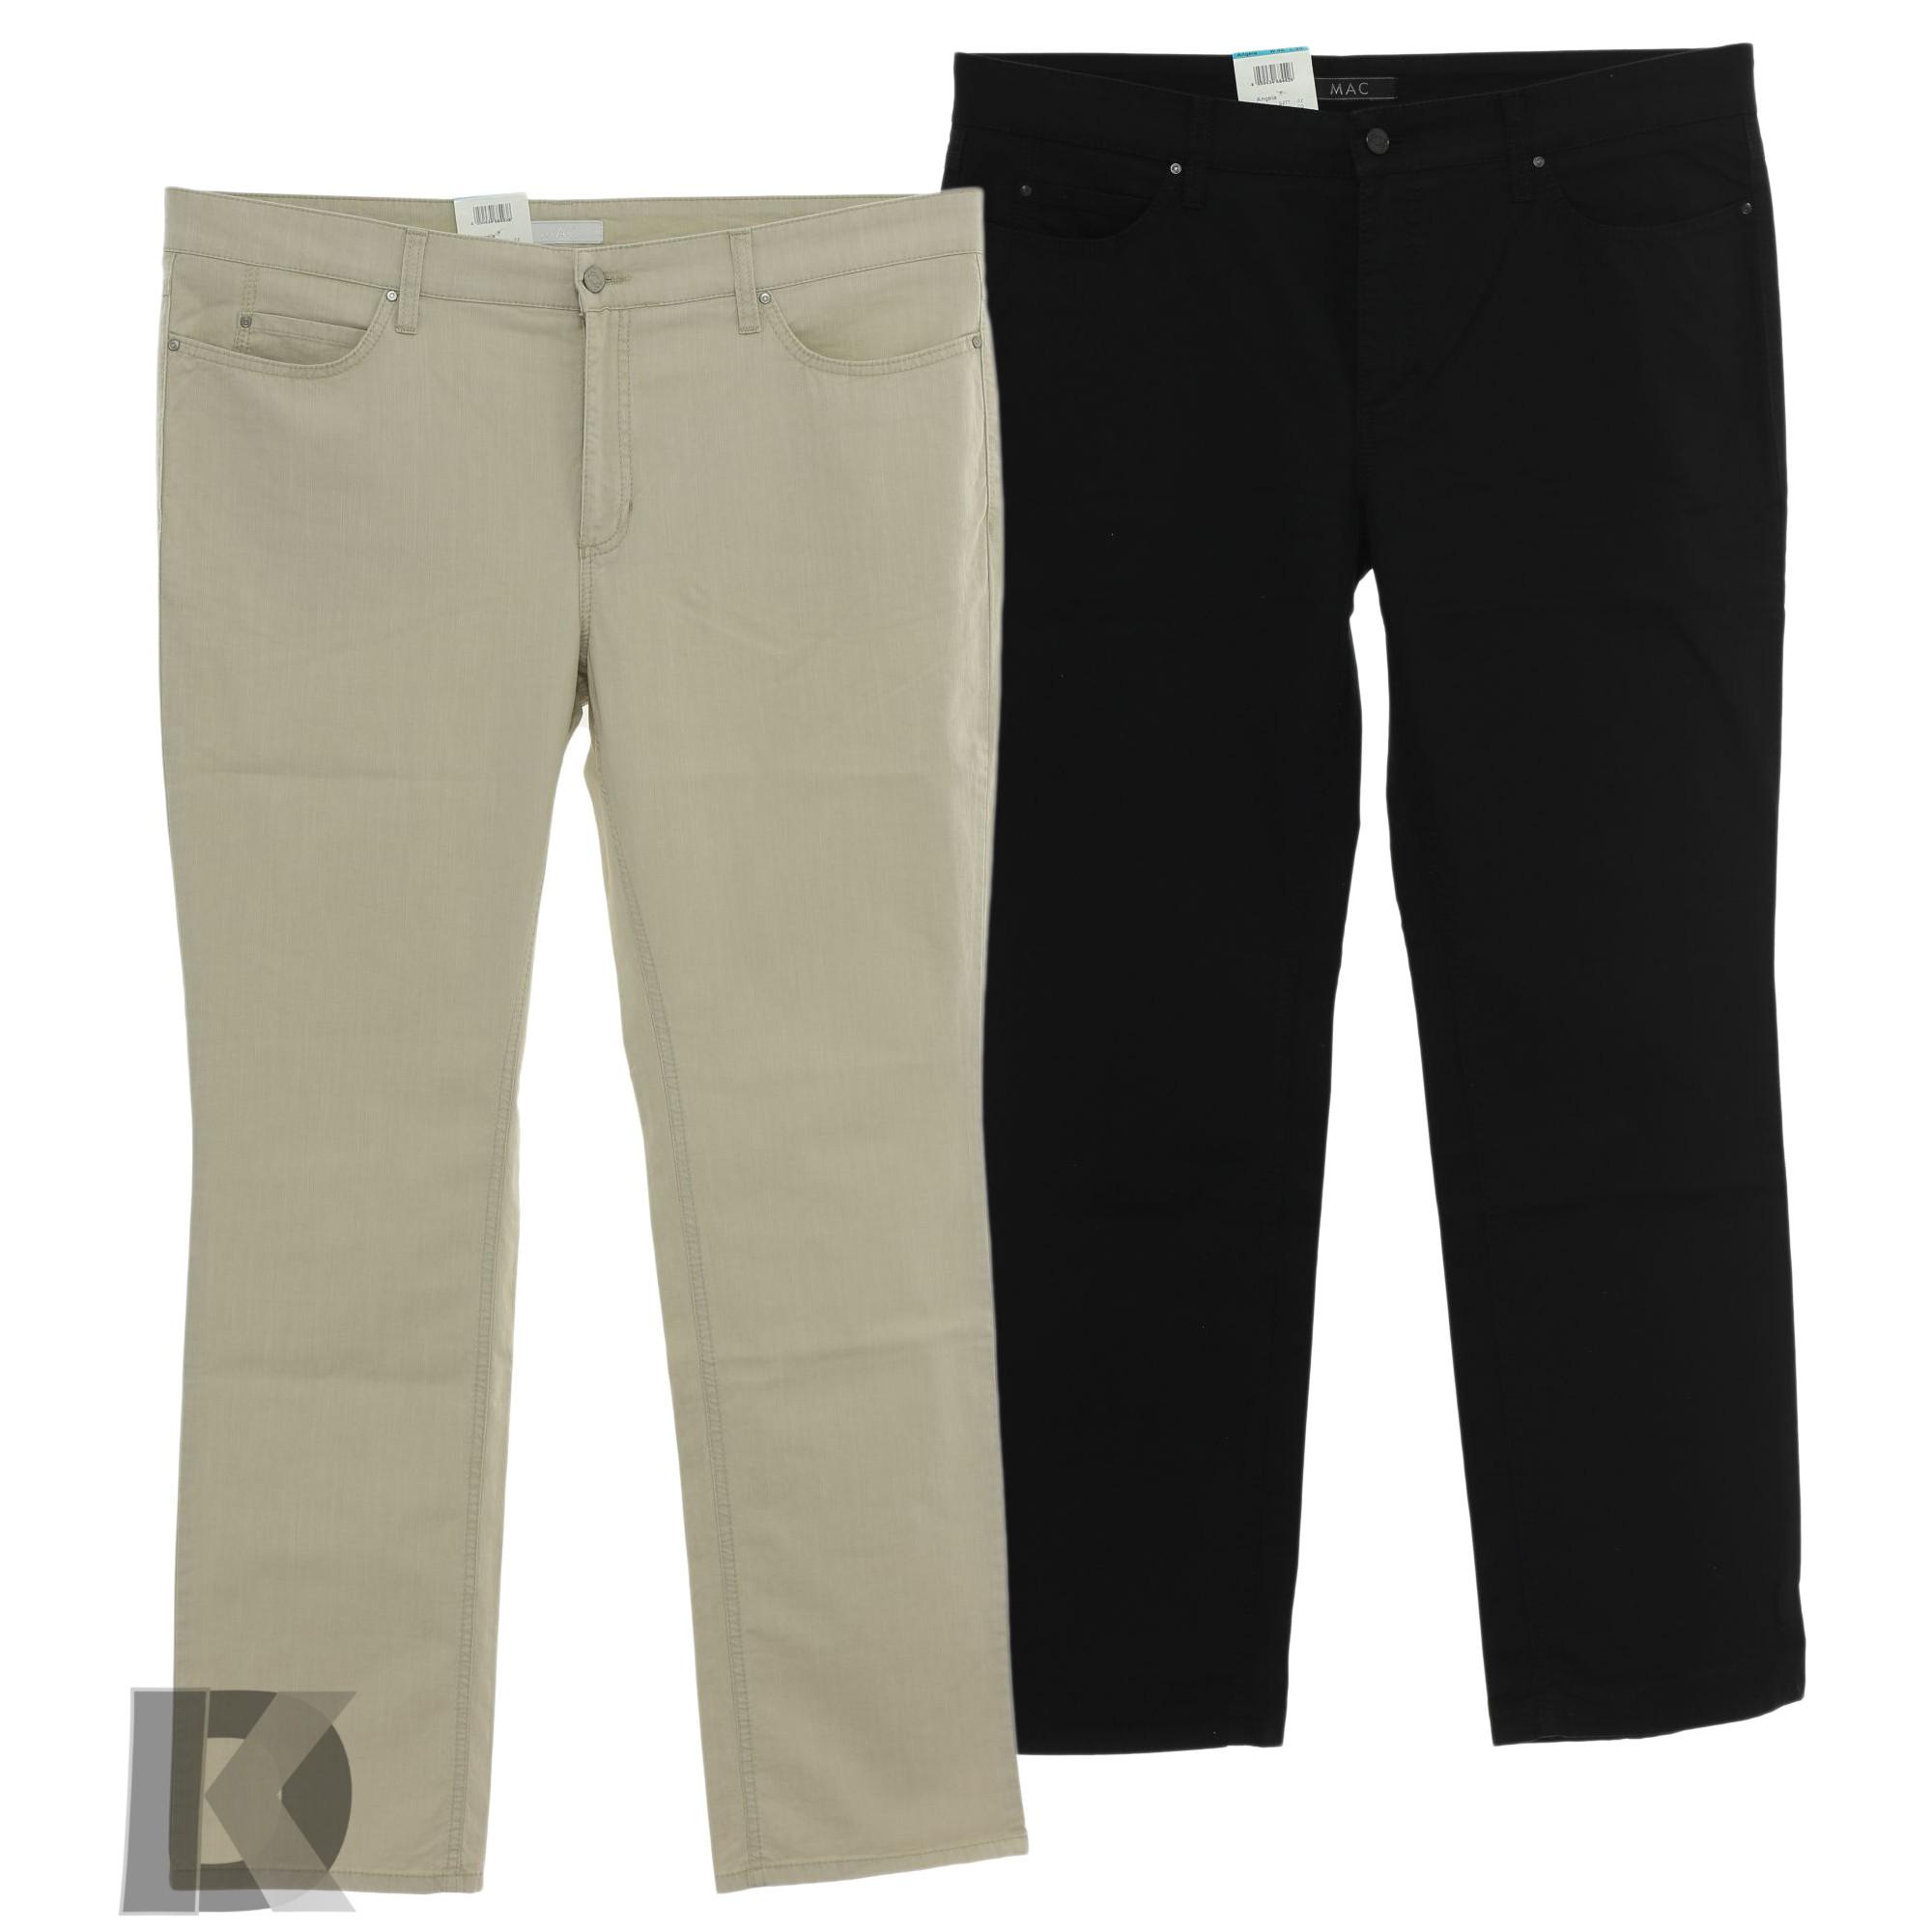 mac jeans angela sound damen stretch gabardine ebay. Black Bedroom Furniture Sets. Home Design Ideas